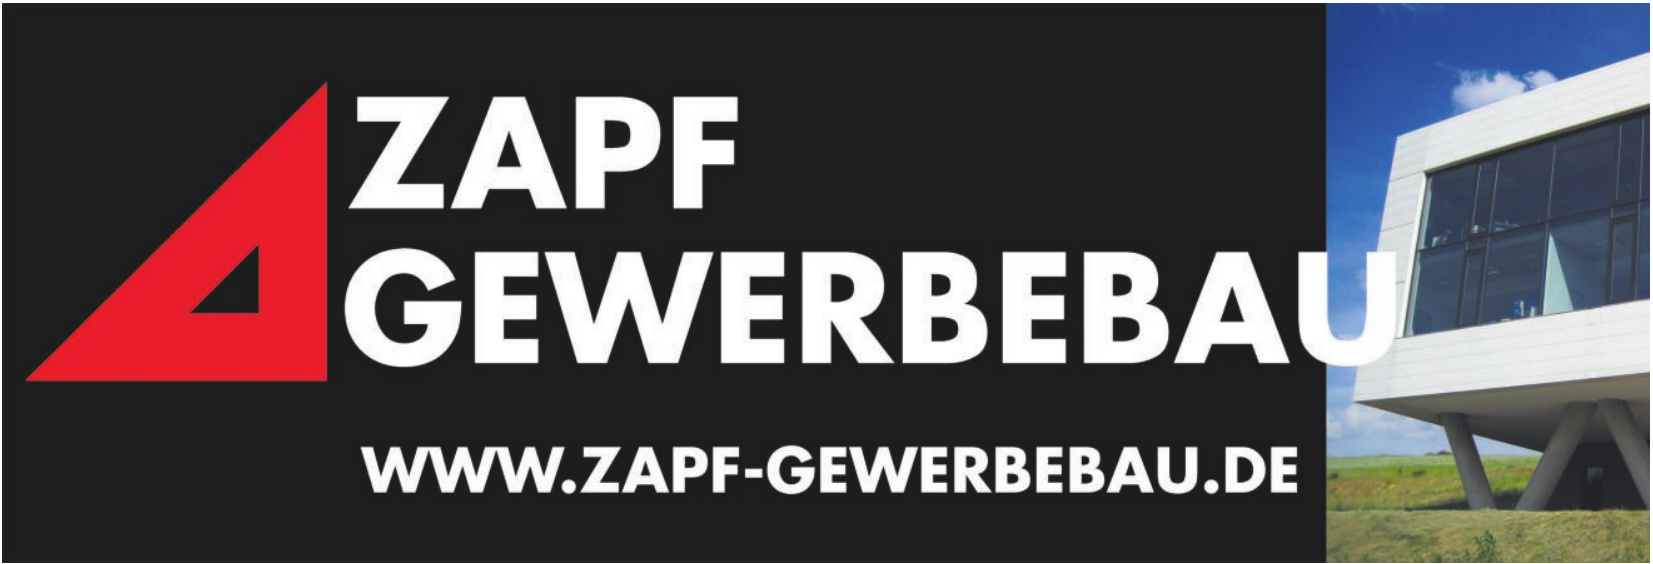 Zapf Gewerbebau